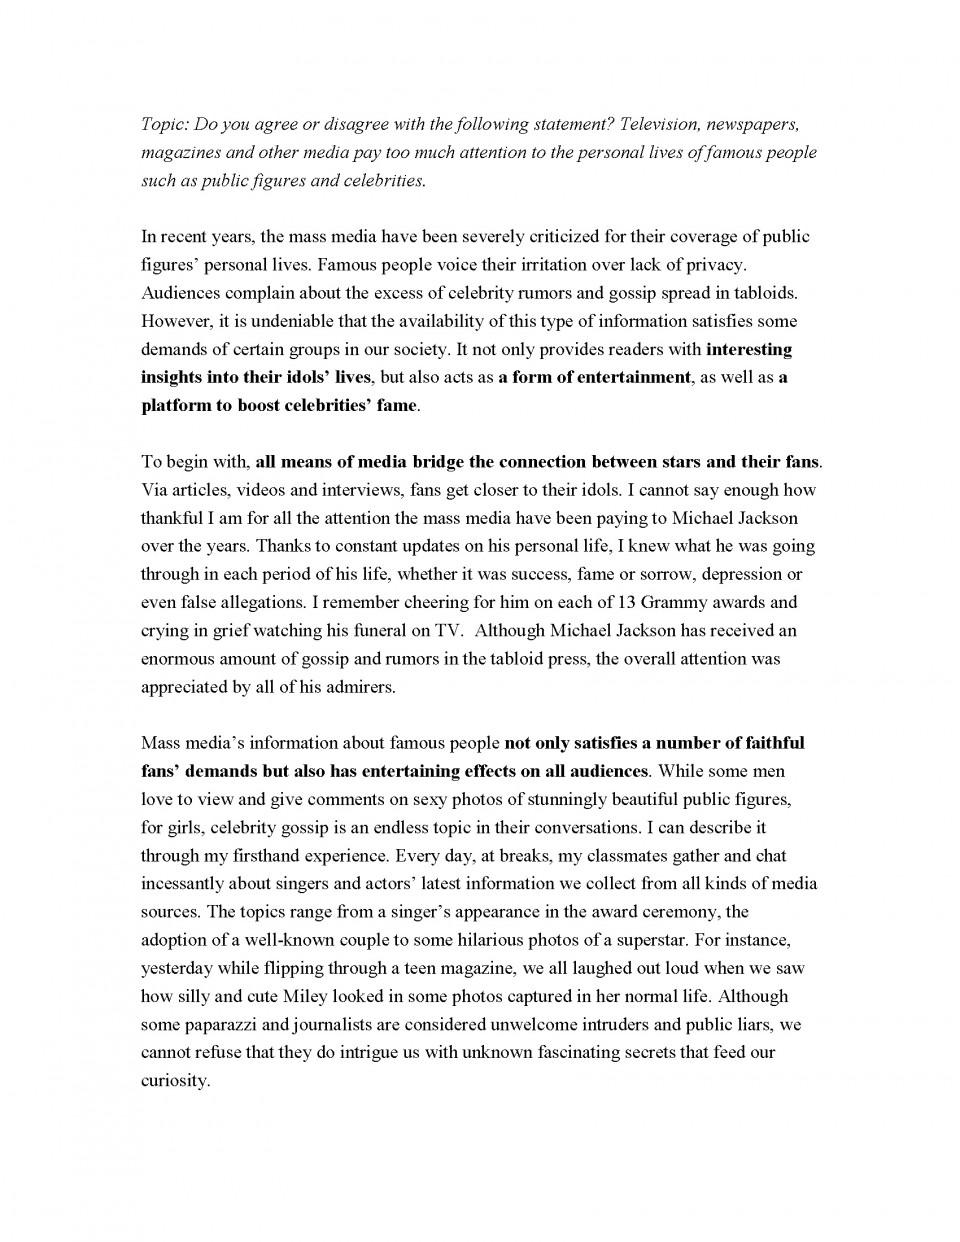 Internet privacy essay